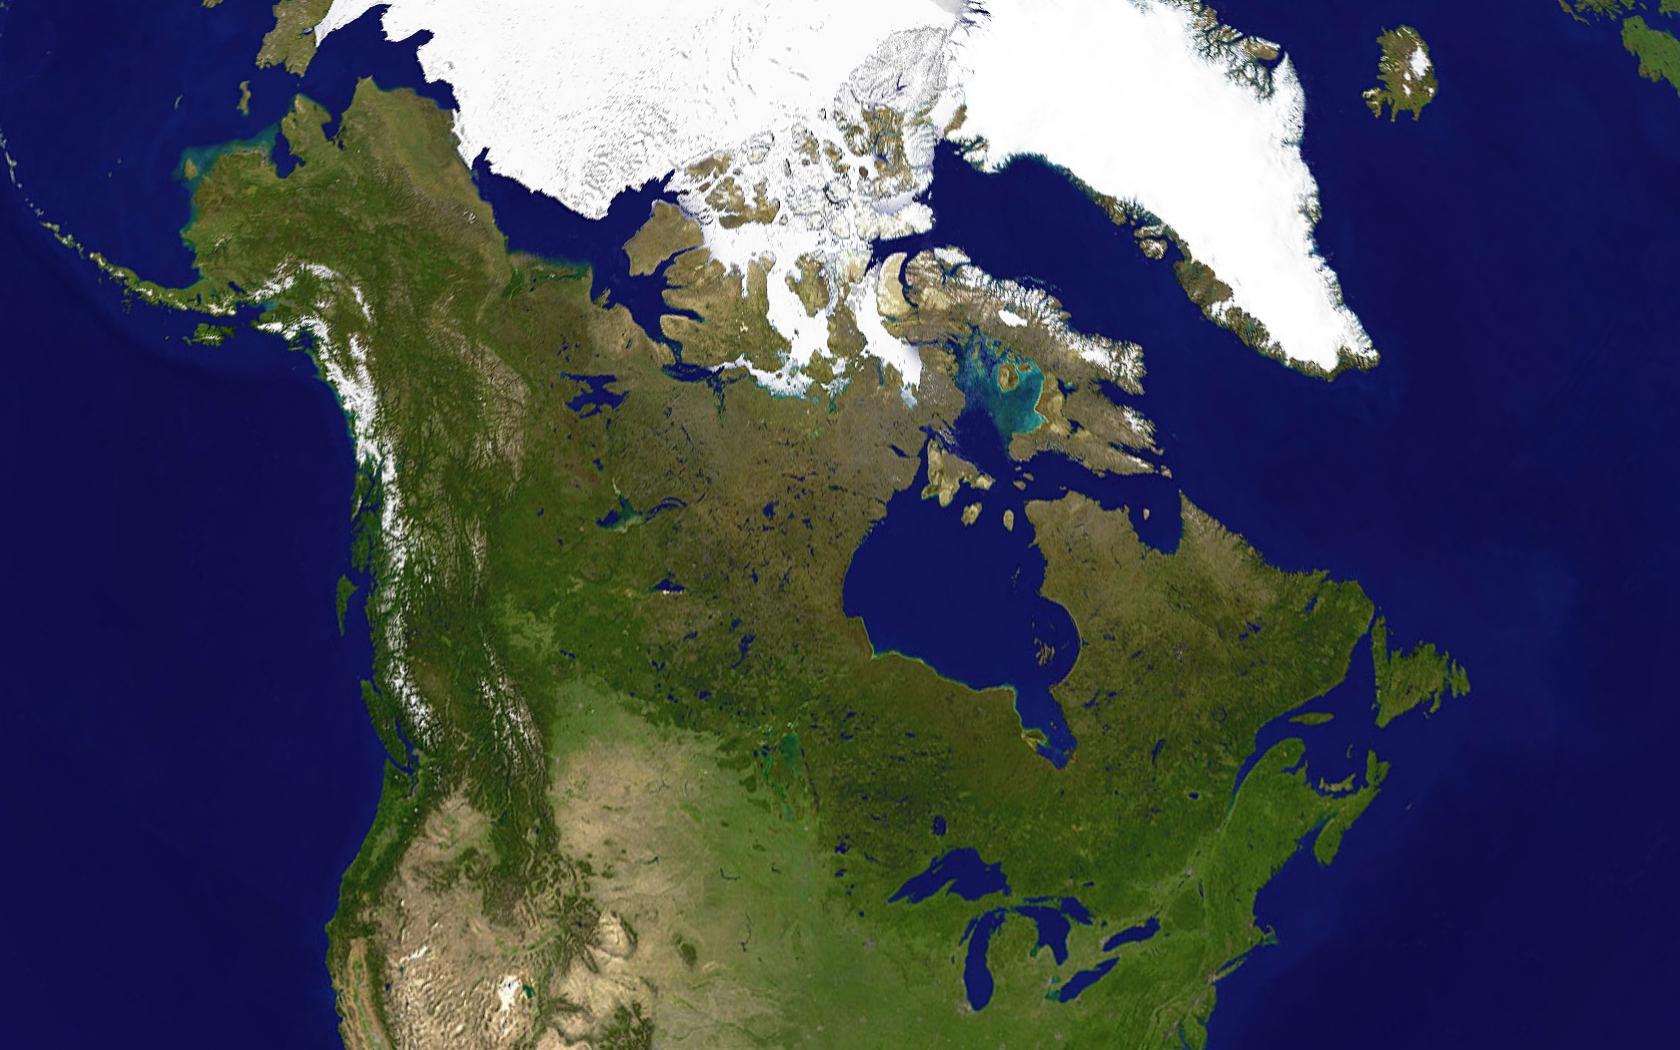 Harta Prin Satelit De Canada Harta De Canada Prin Satelit